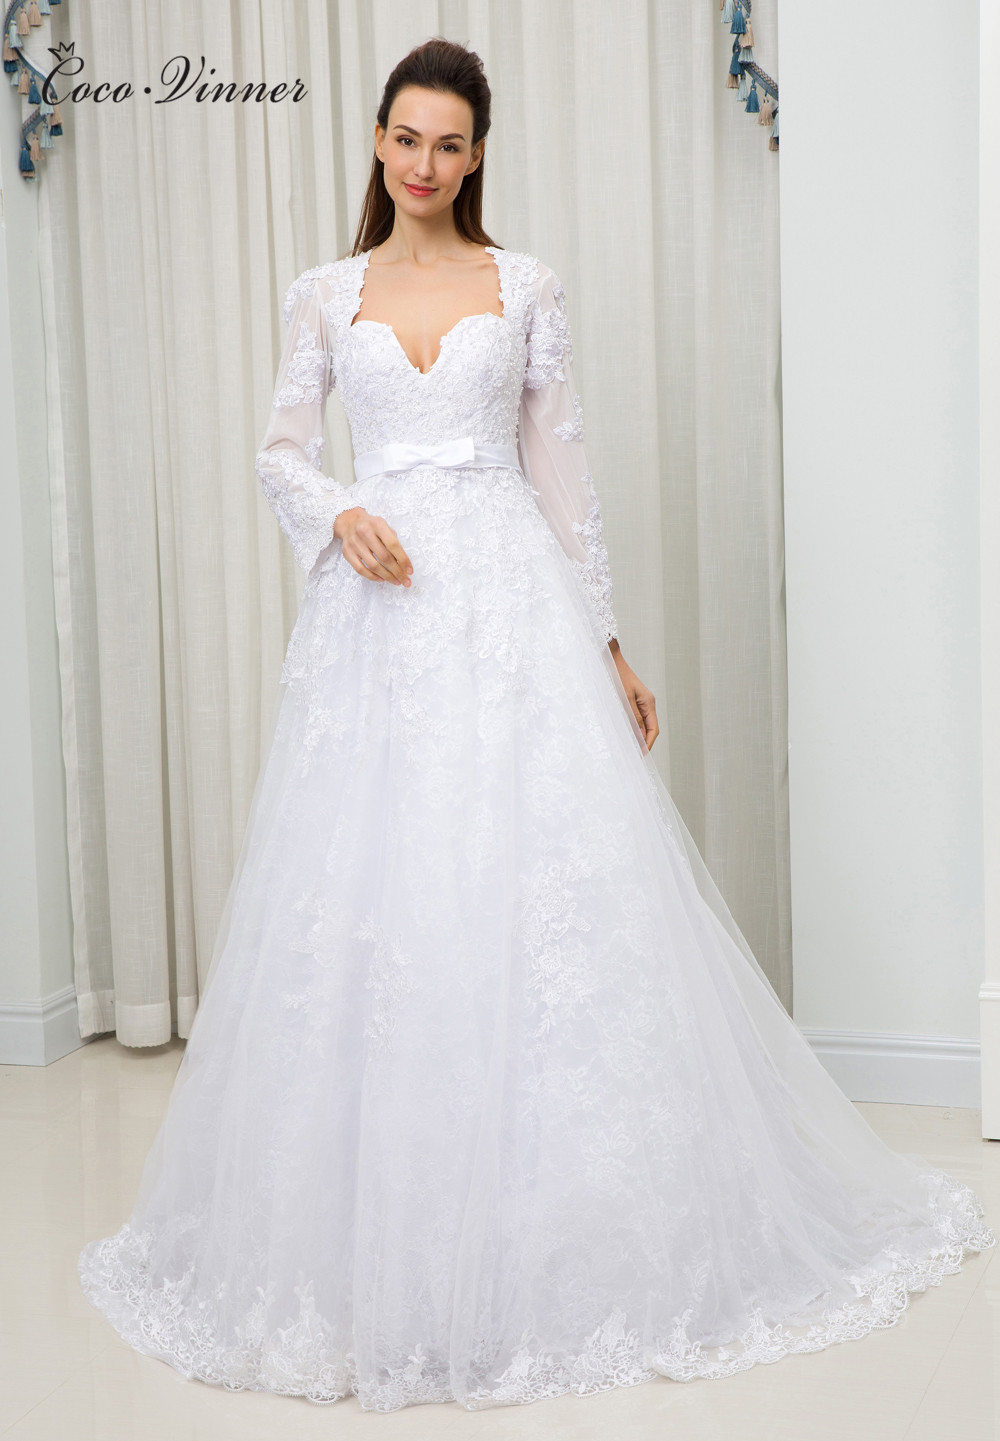 C.V New 2018 V neck Elegant A line Wedding Dress vestido-de-noiva Pearls Beads Lace Embroidery Plus Size Wedding Dresses W0112